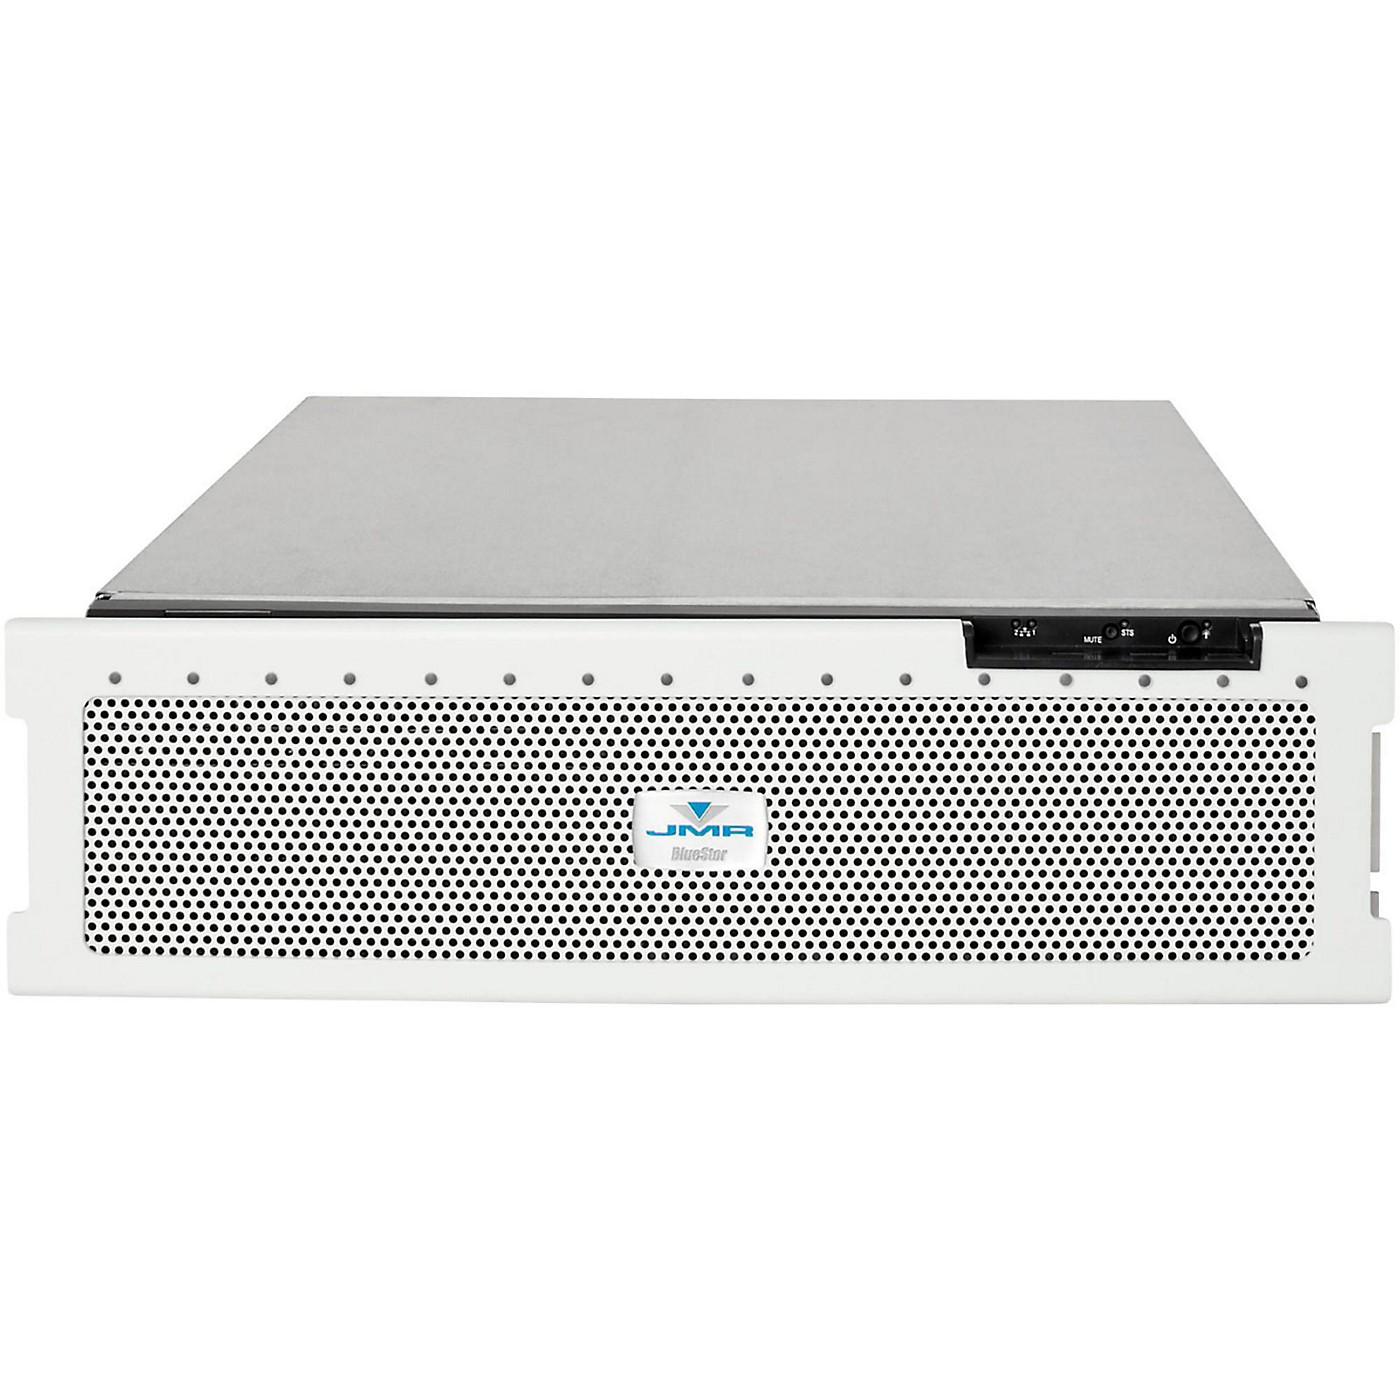 JMR Electronics BlueStor SAS Expander RAID System thumbnail